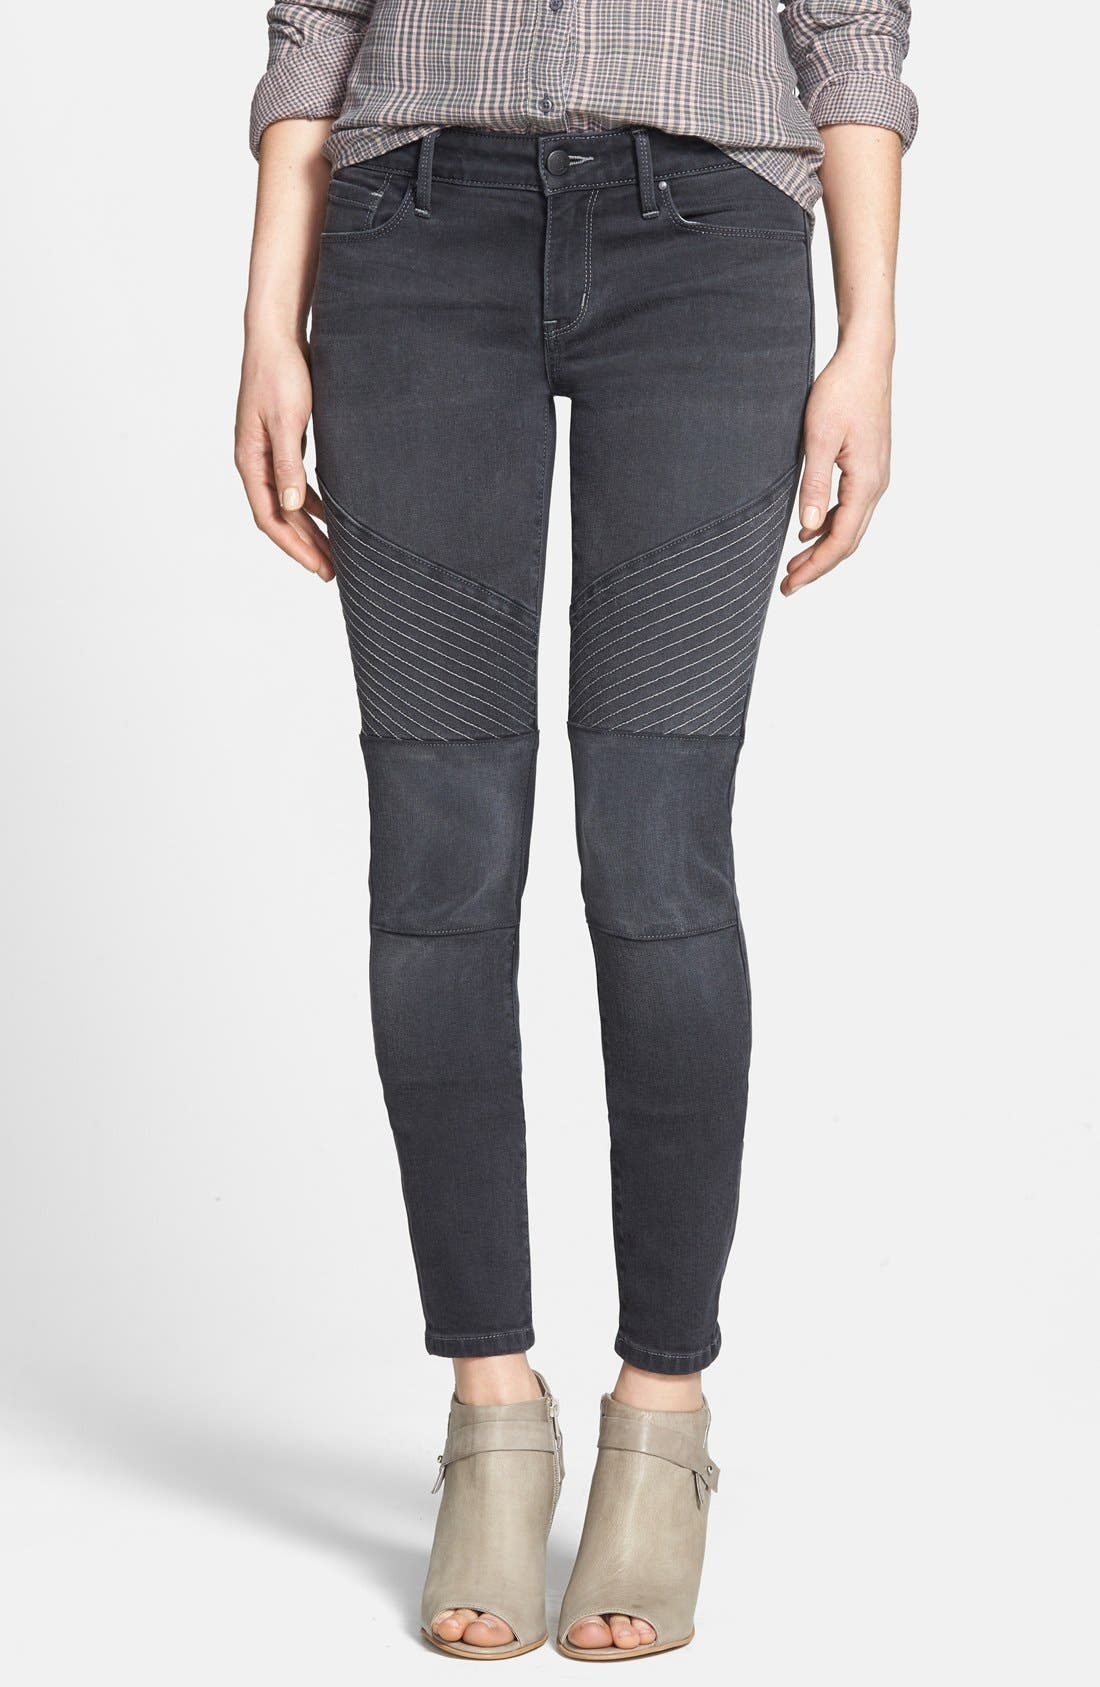 Main Image - Treasure&Bond Moto Jeans (Washed Black)